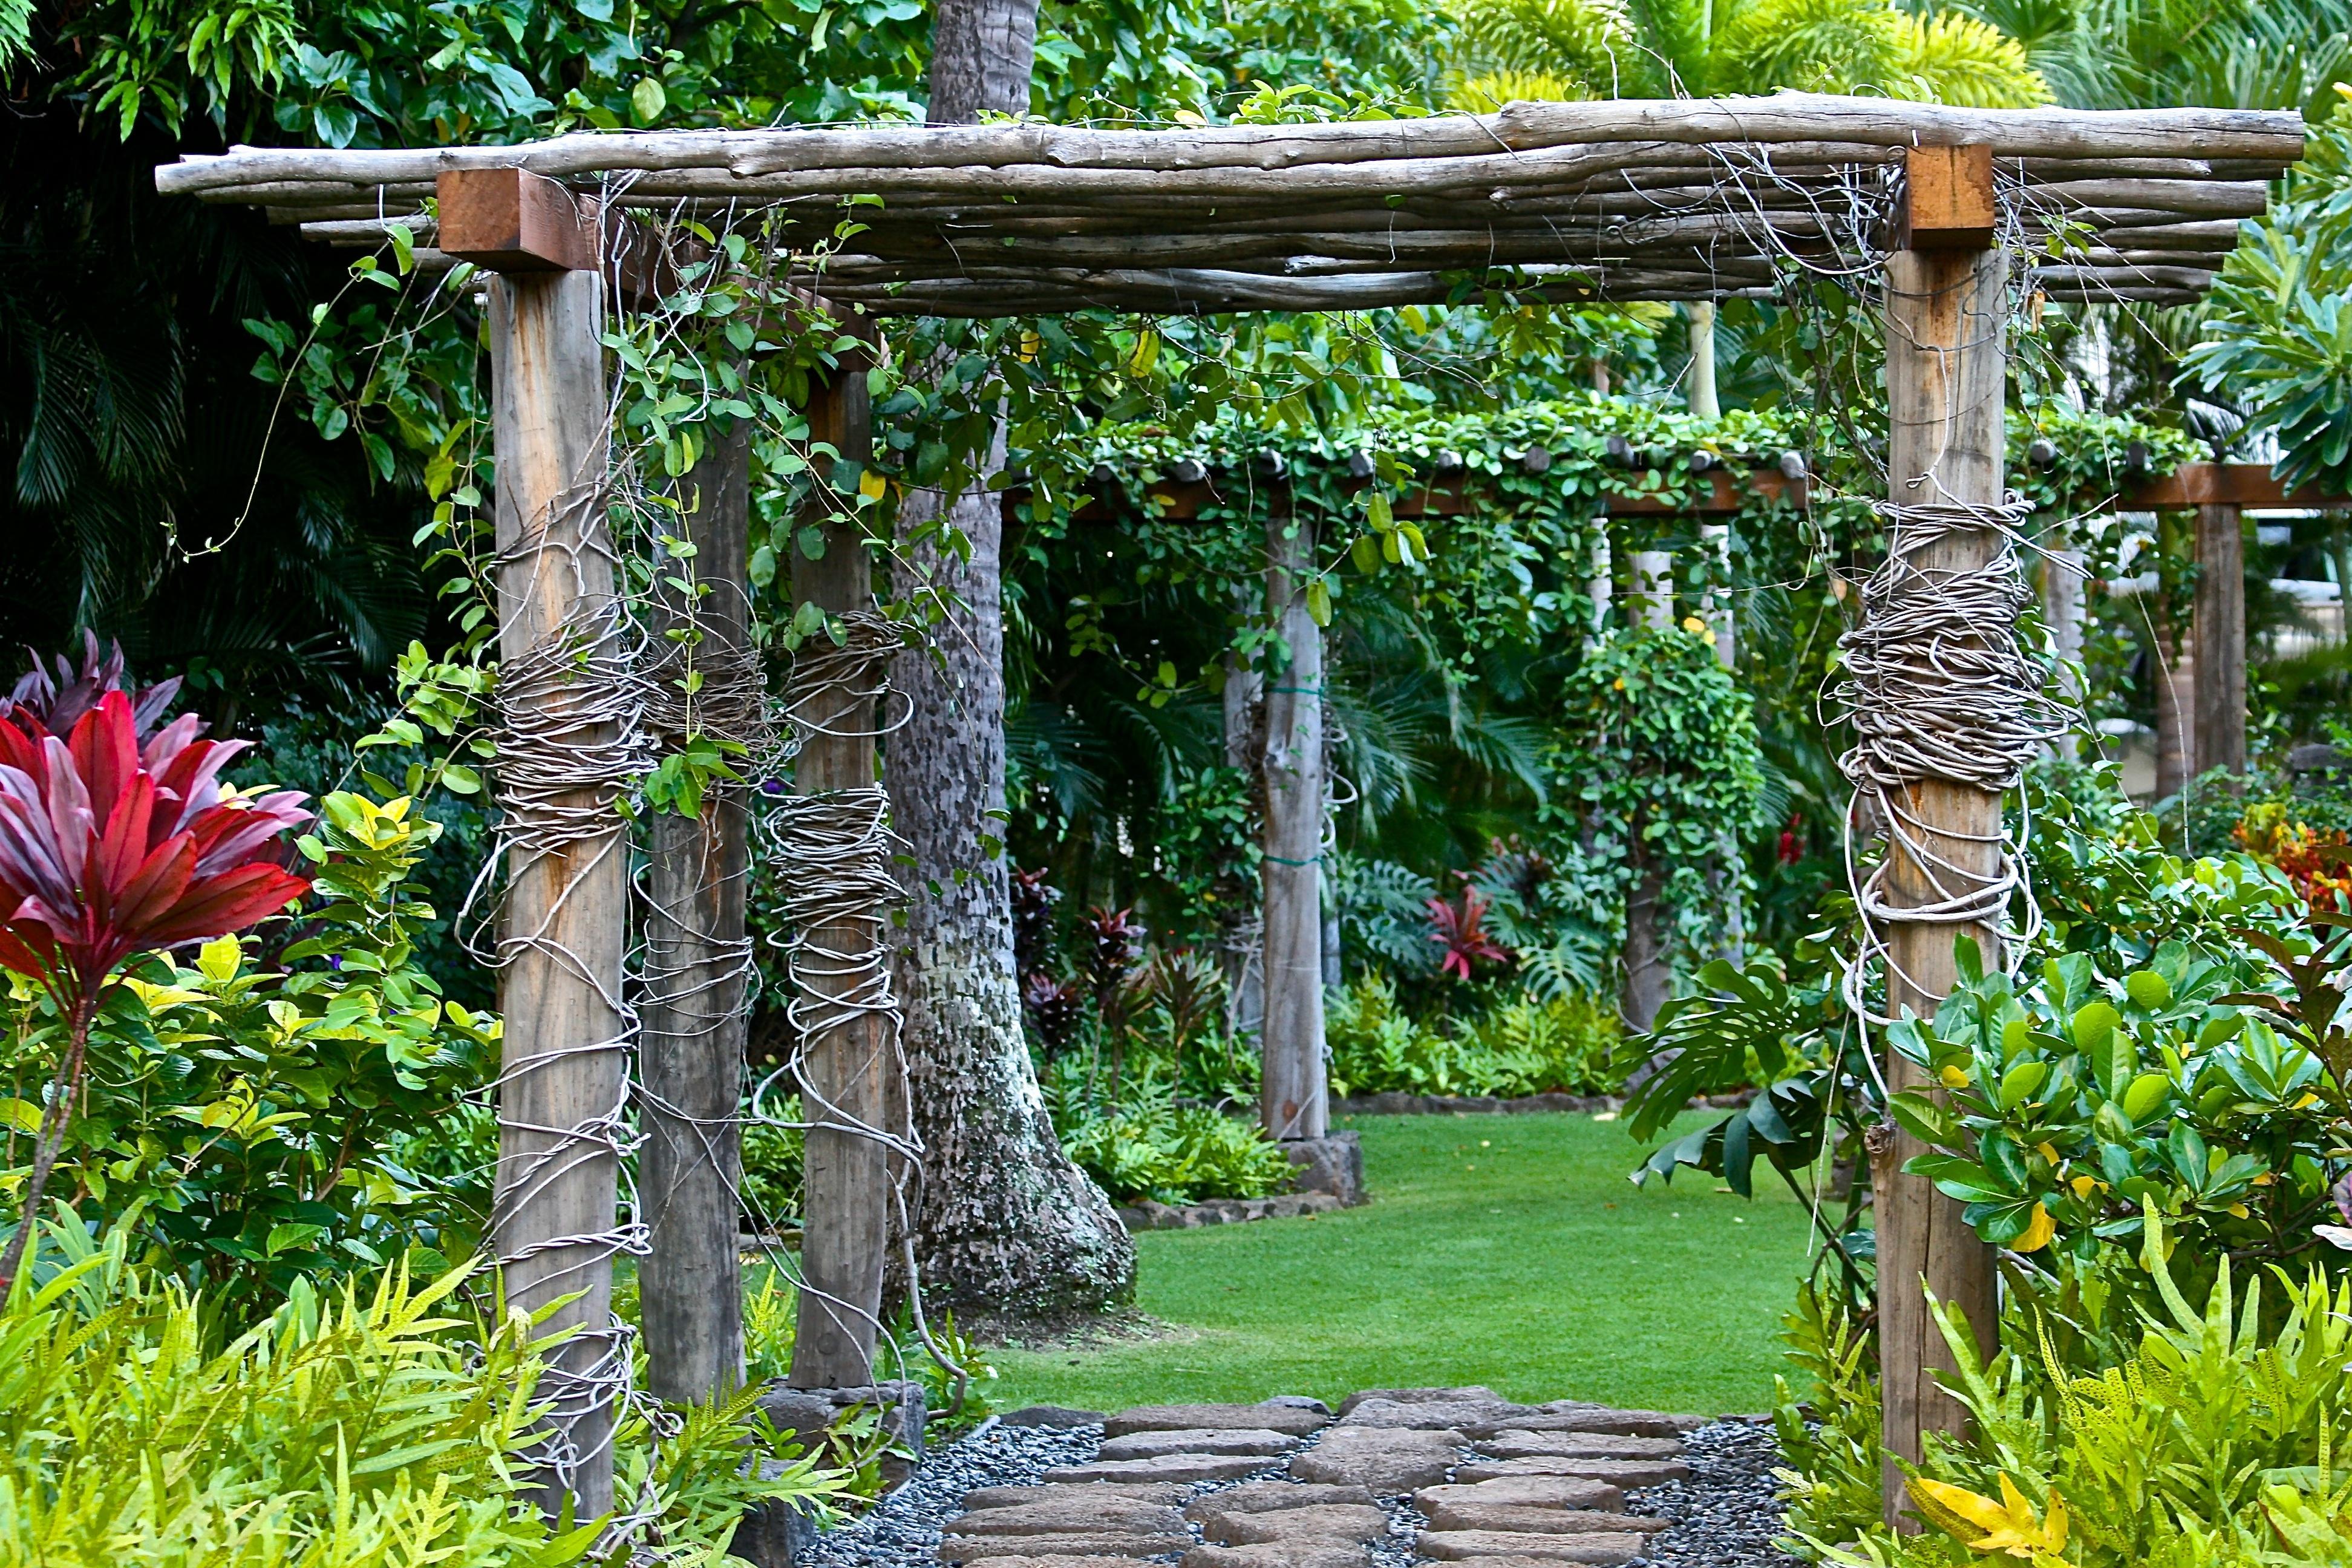 landschaft gras holz blume grn dschungel hinterhof botanik garten pflanzen bume entspannung entwurf privatgelnde botanischer garten - Hinterhoflandschaften Designs